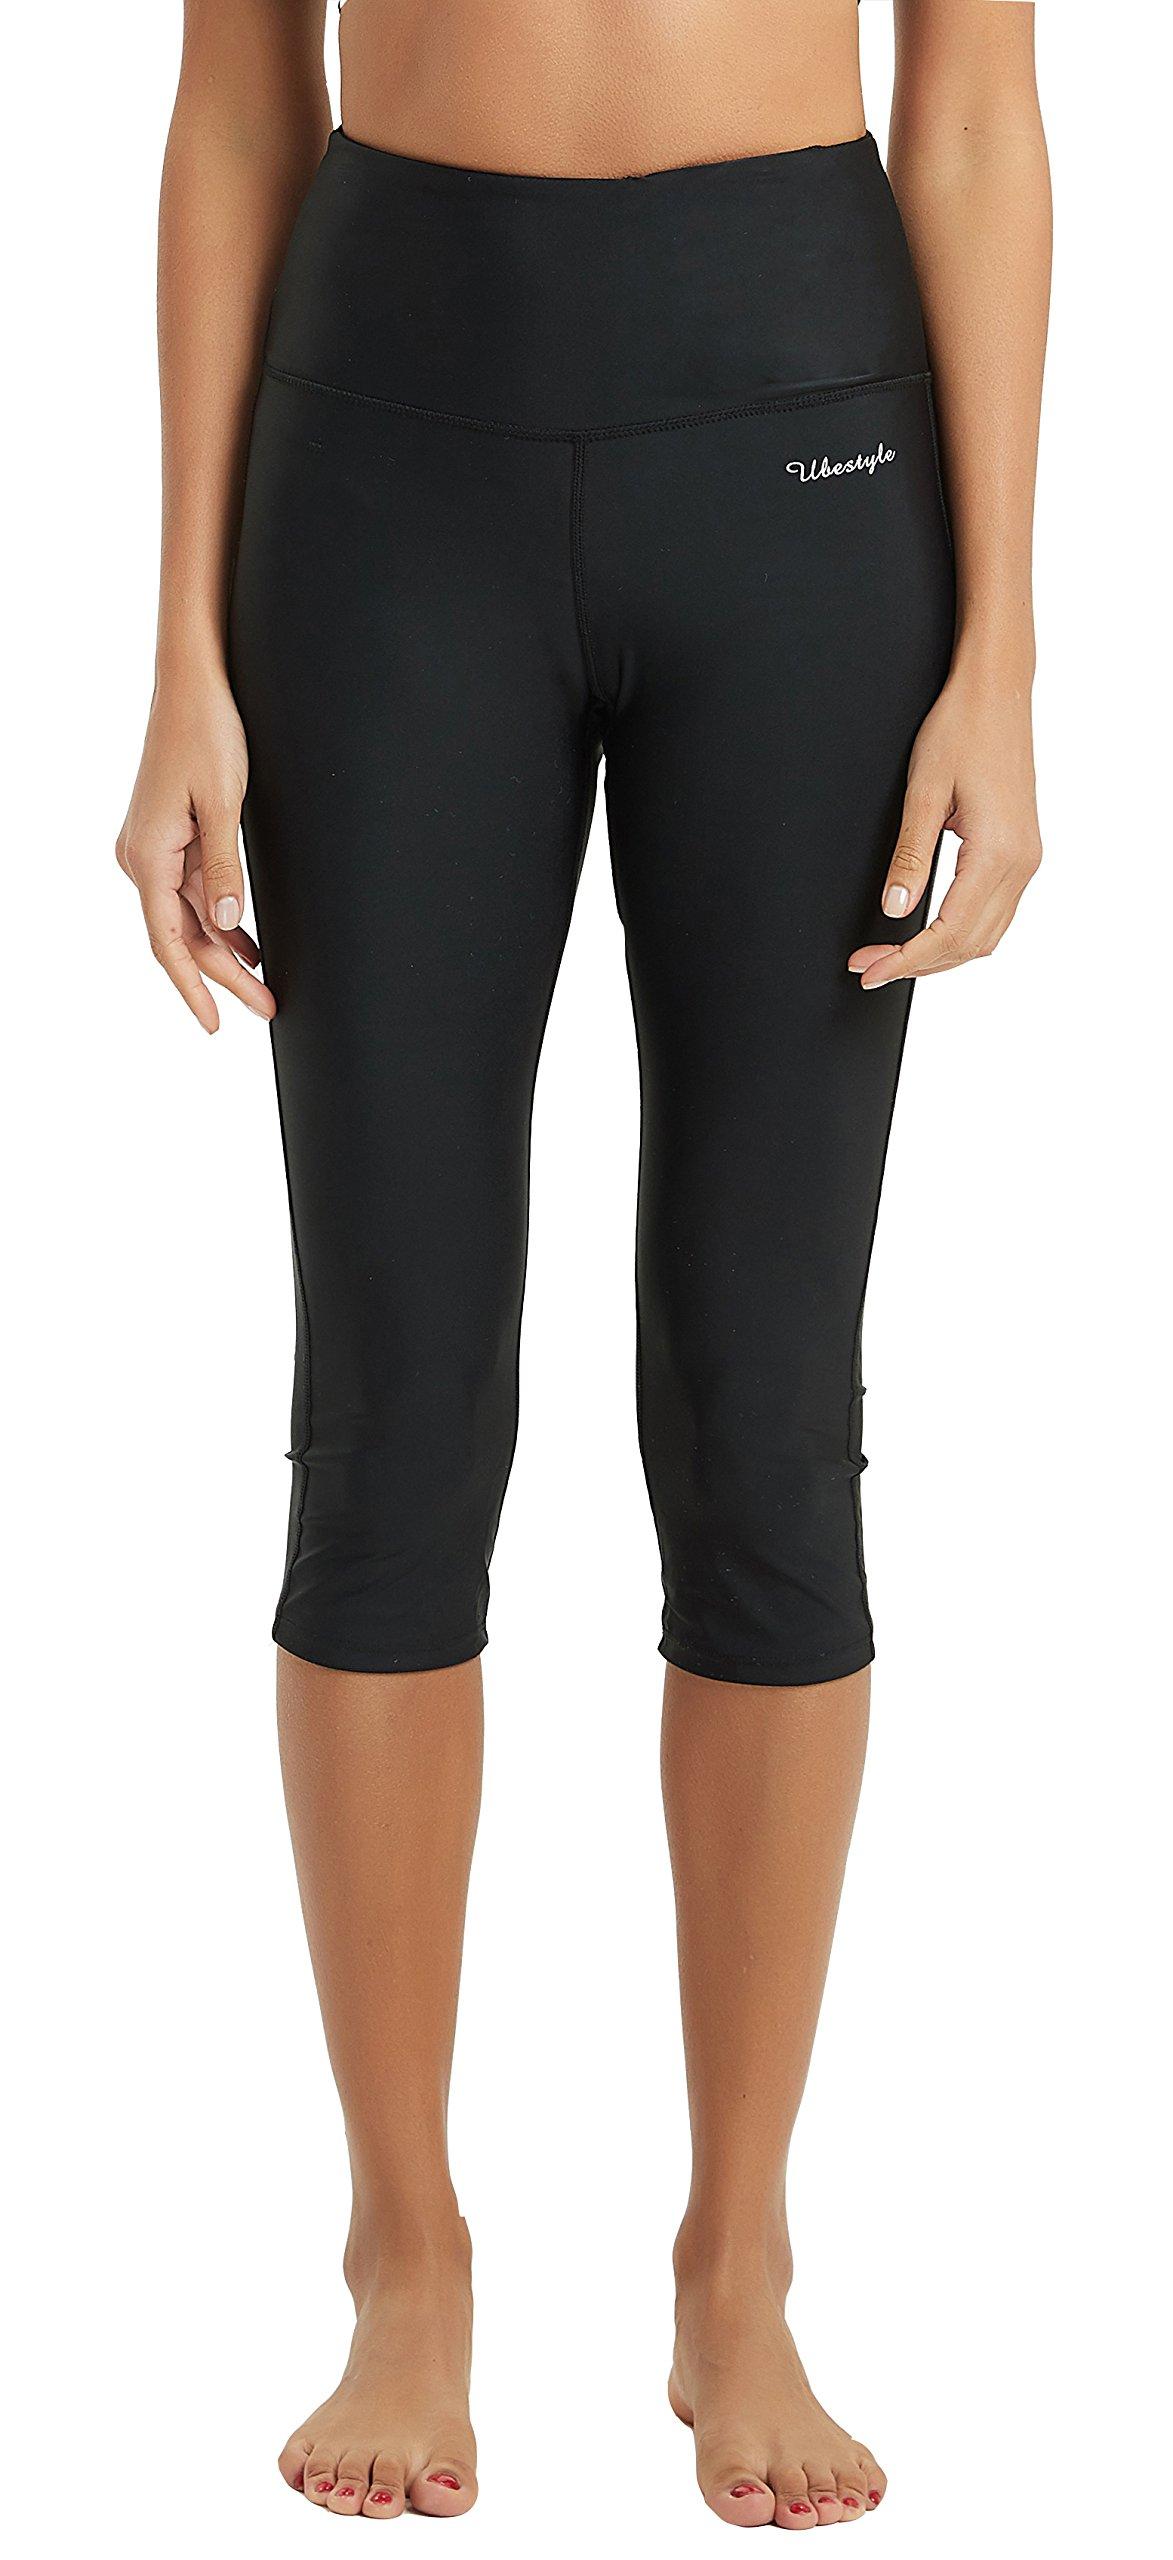 Ubestyle UPF 50+ High Waist Women's Yoga Capri Leggings Swimming Tights Sun Protective